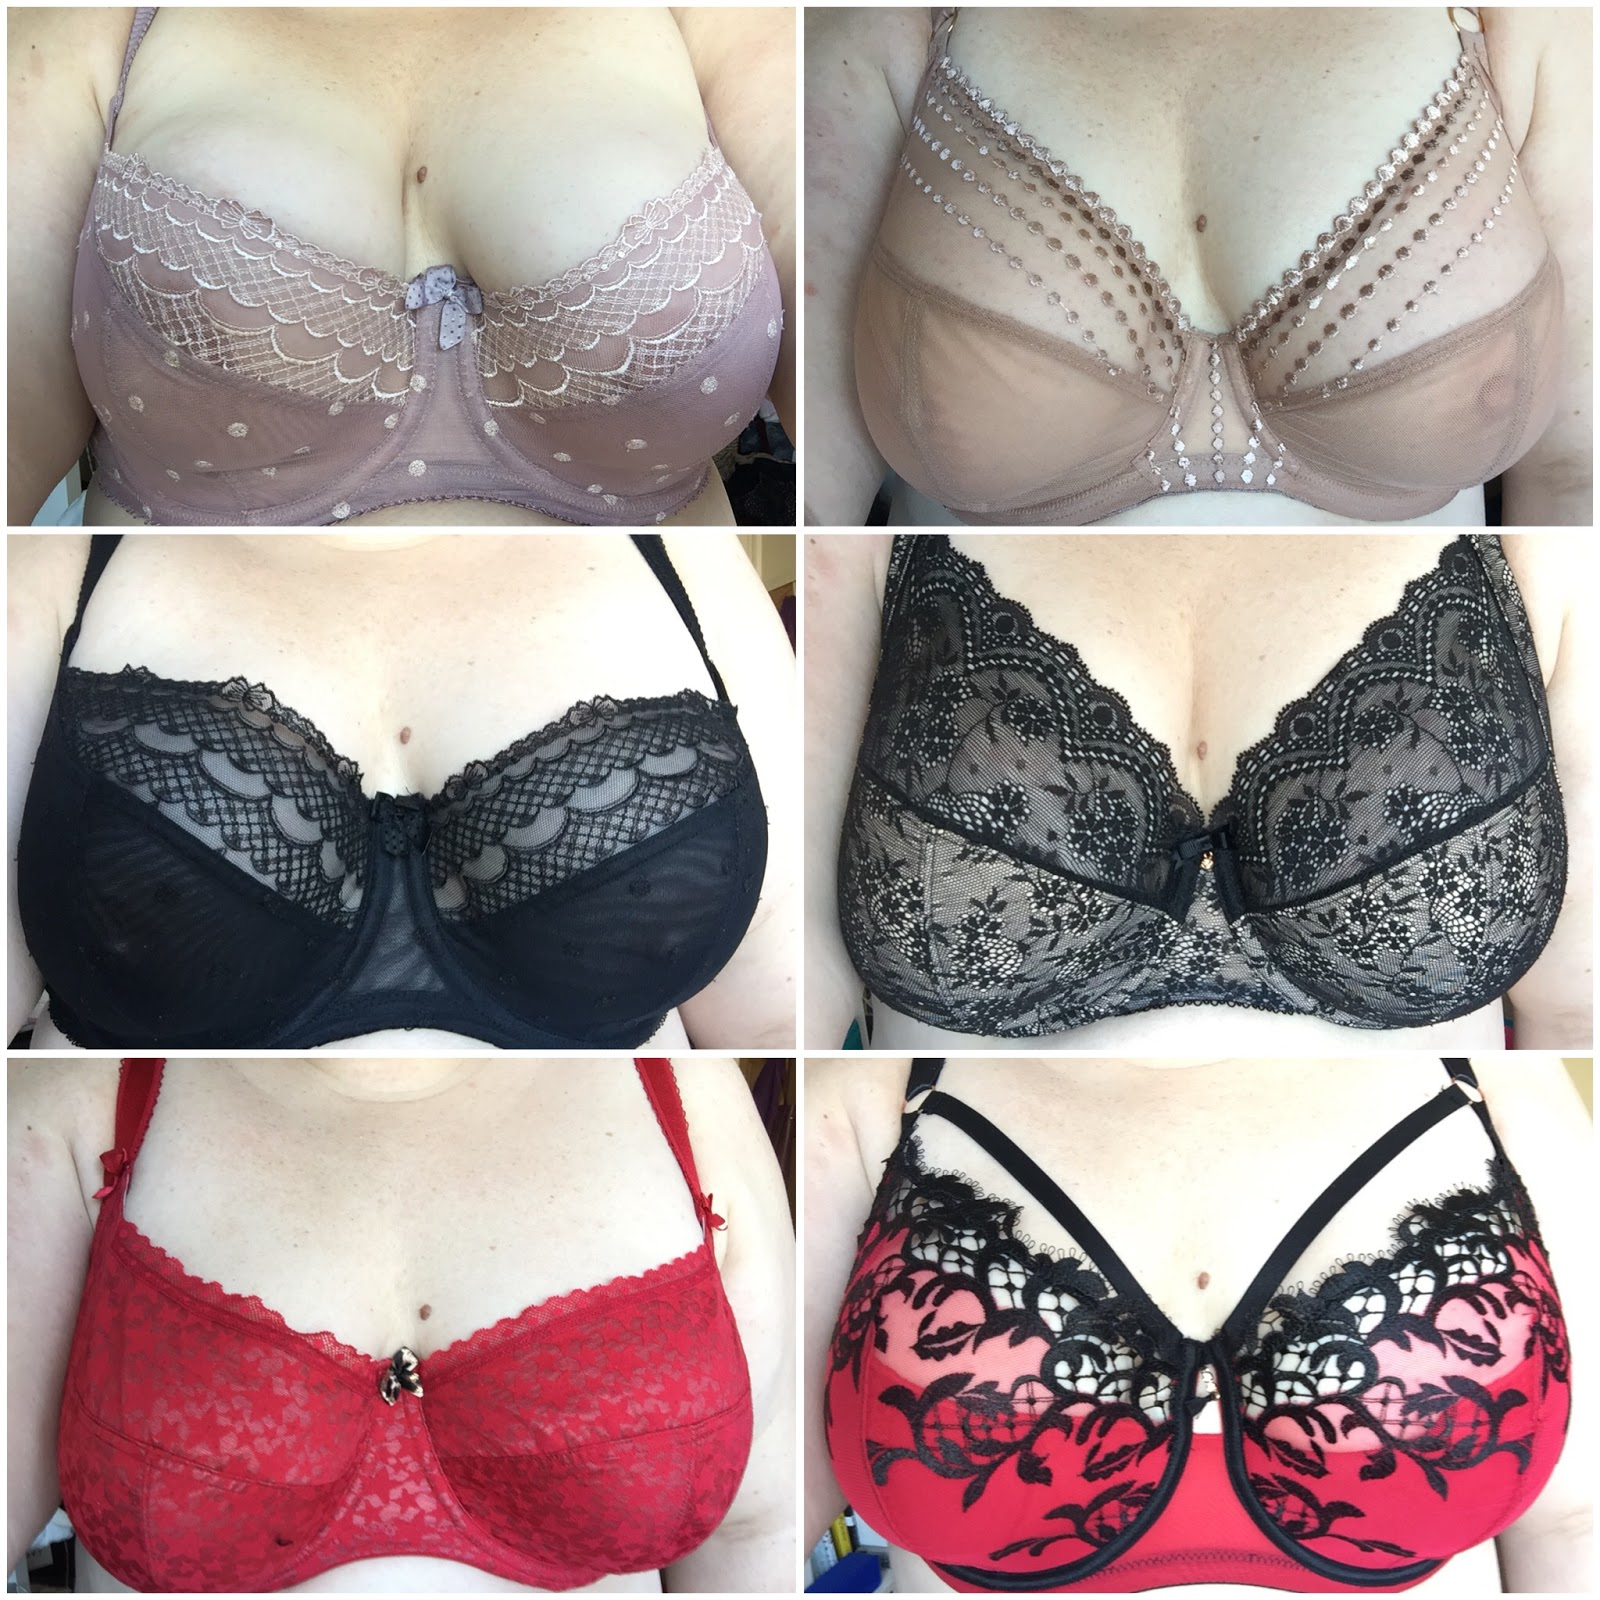 89eabd226e Boob Revolution 2  Overhauling your bra wardrobe